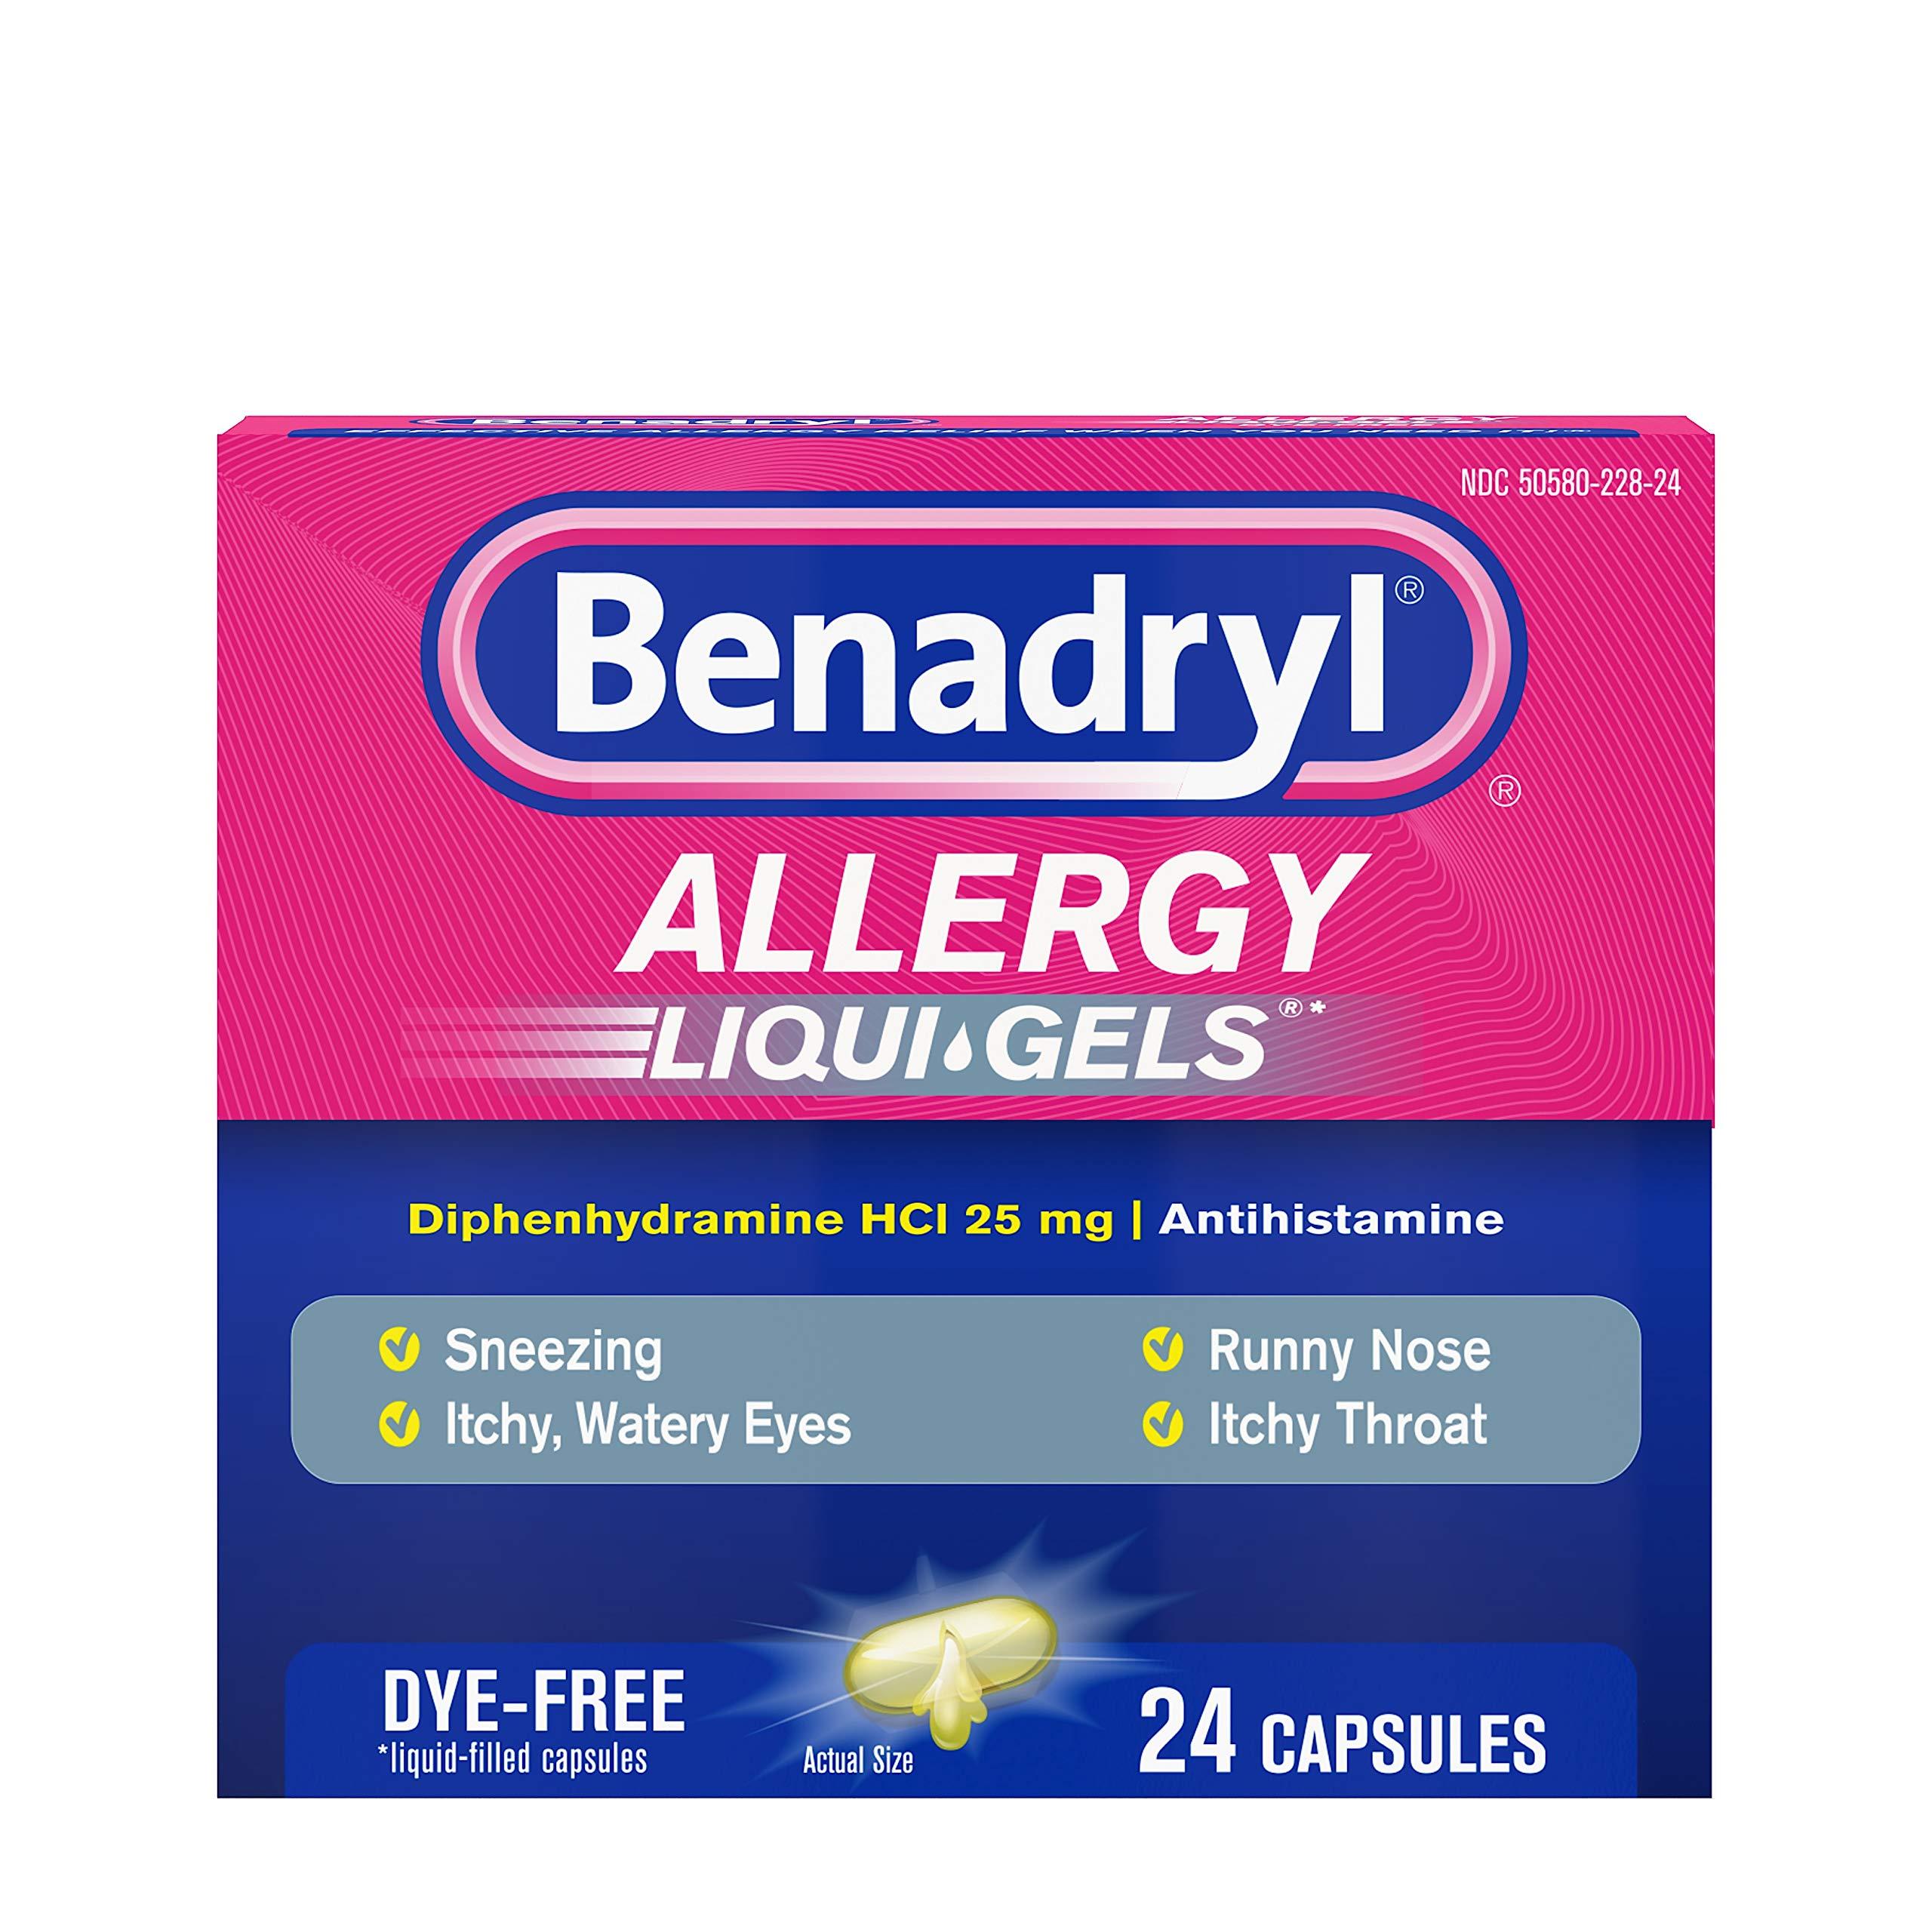 Benadryl Liqui-Gels Antihistamine Allergy Medicine & Cold Relief, Dye Free, 24 ct